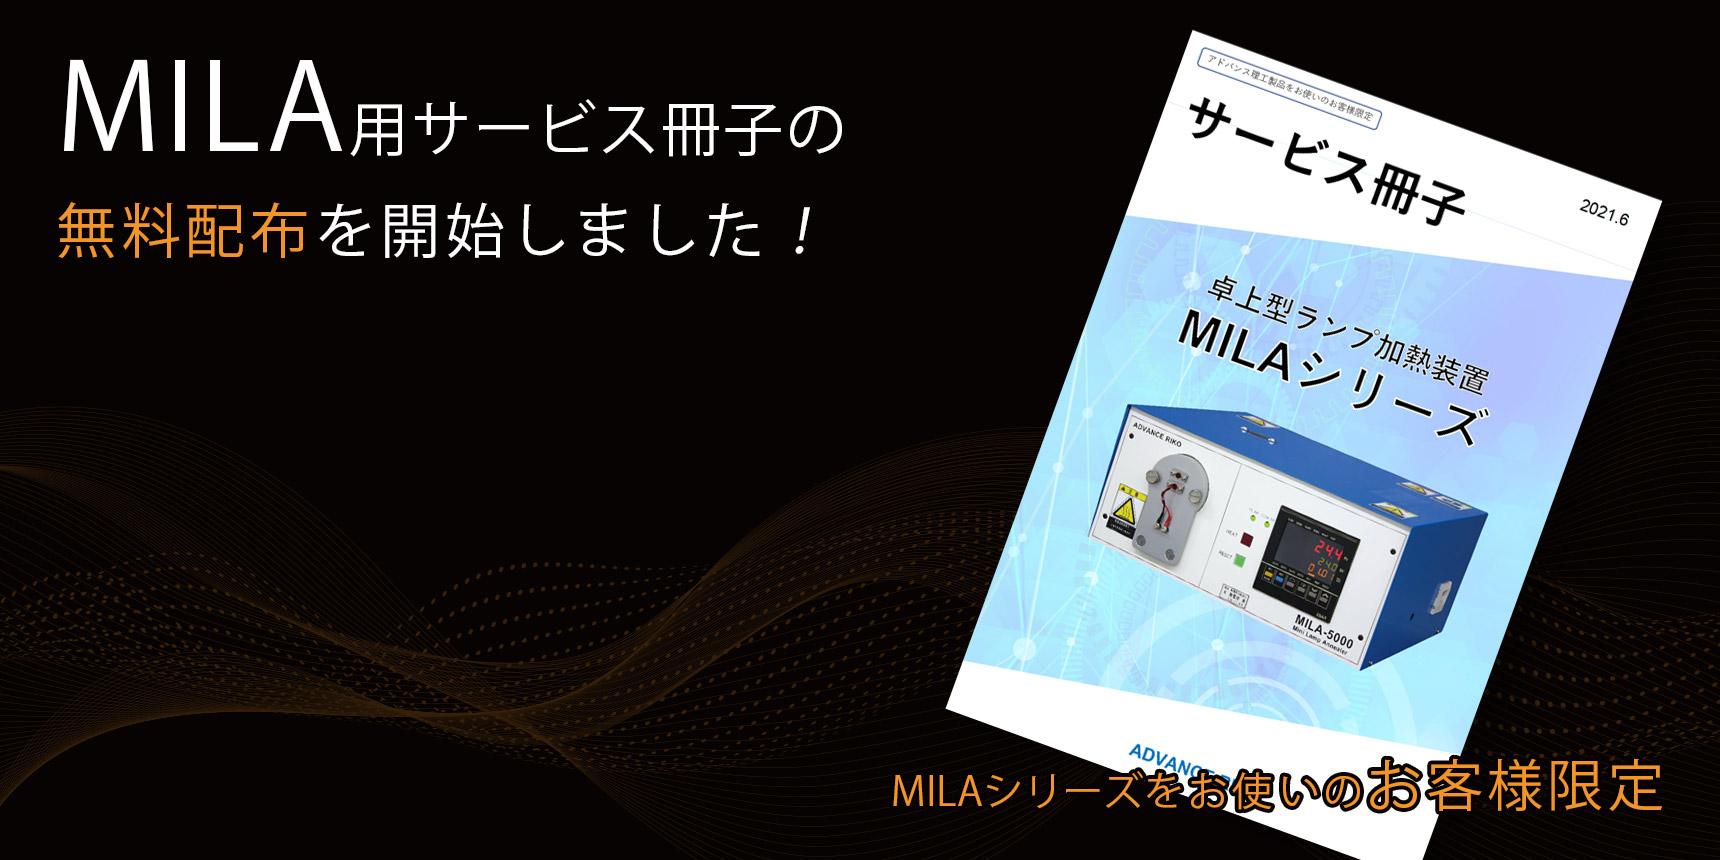 MILA用サービス冊子 無料配布を開始しました!